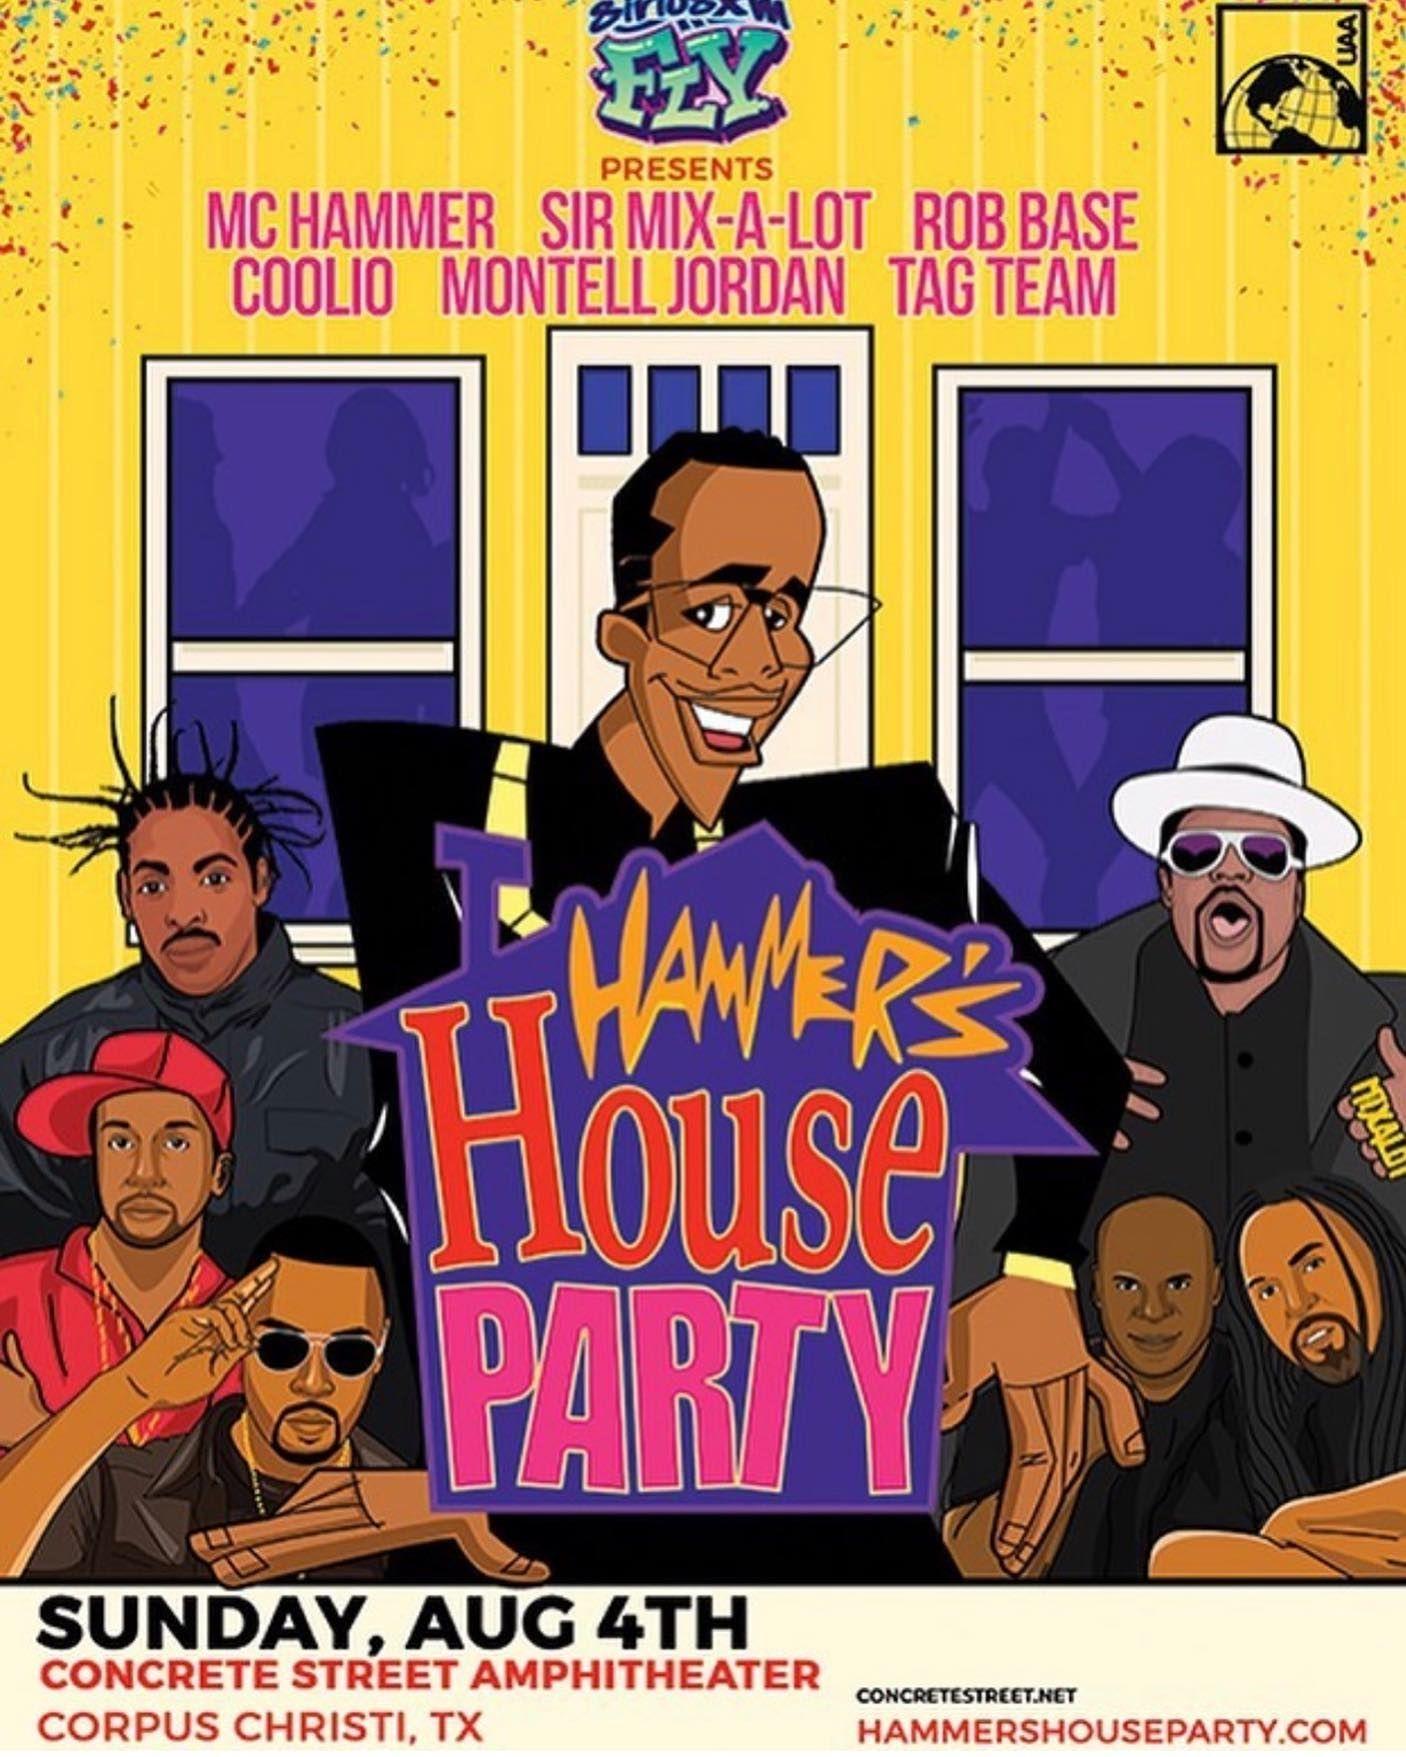 #hammershouseparty #mchammer #sirmixalot #robbase #coolio #montelljordan #tagteam#hammershouseparty #mchammer #sirmixalot #robbase #coolio #montelljordan #tagteam